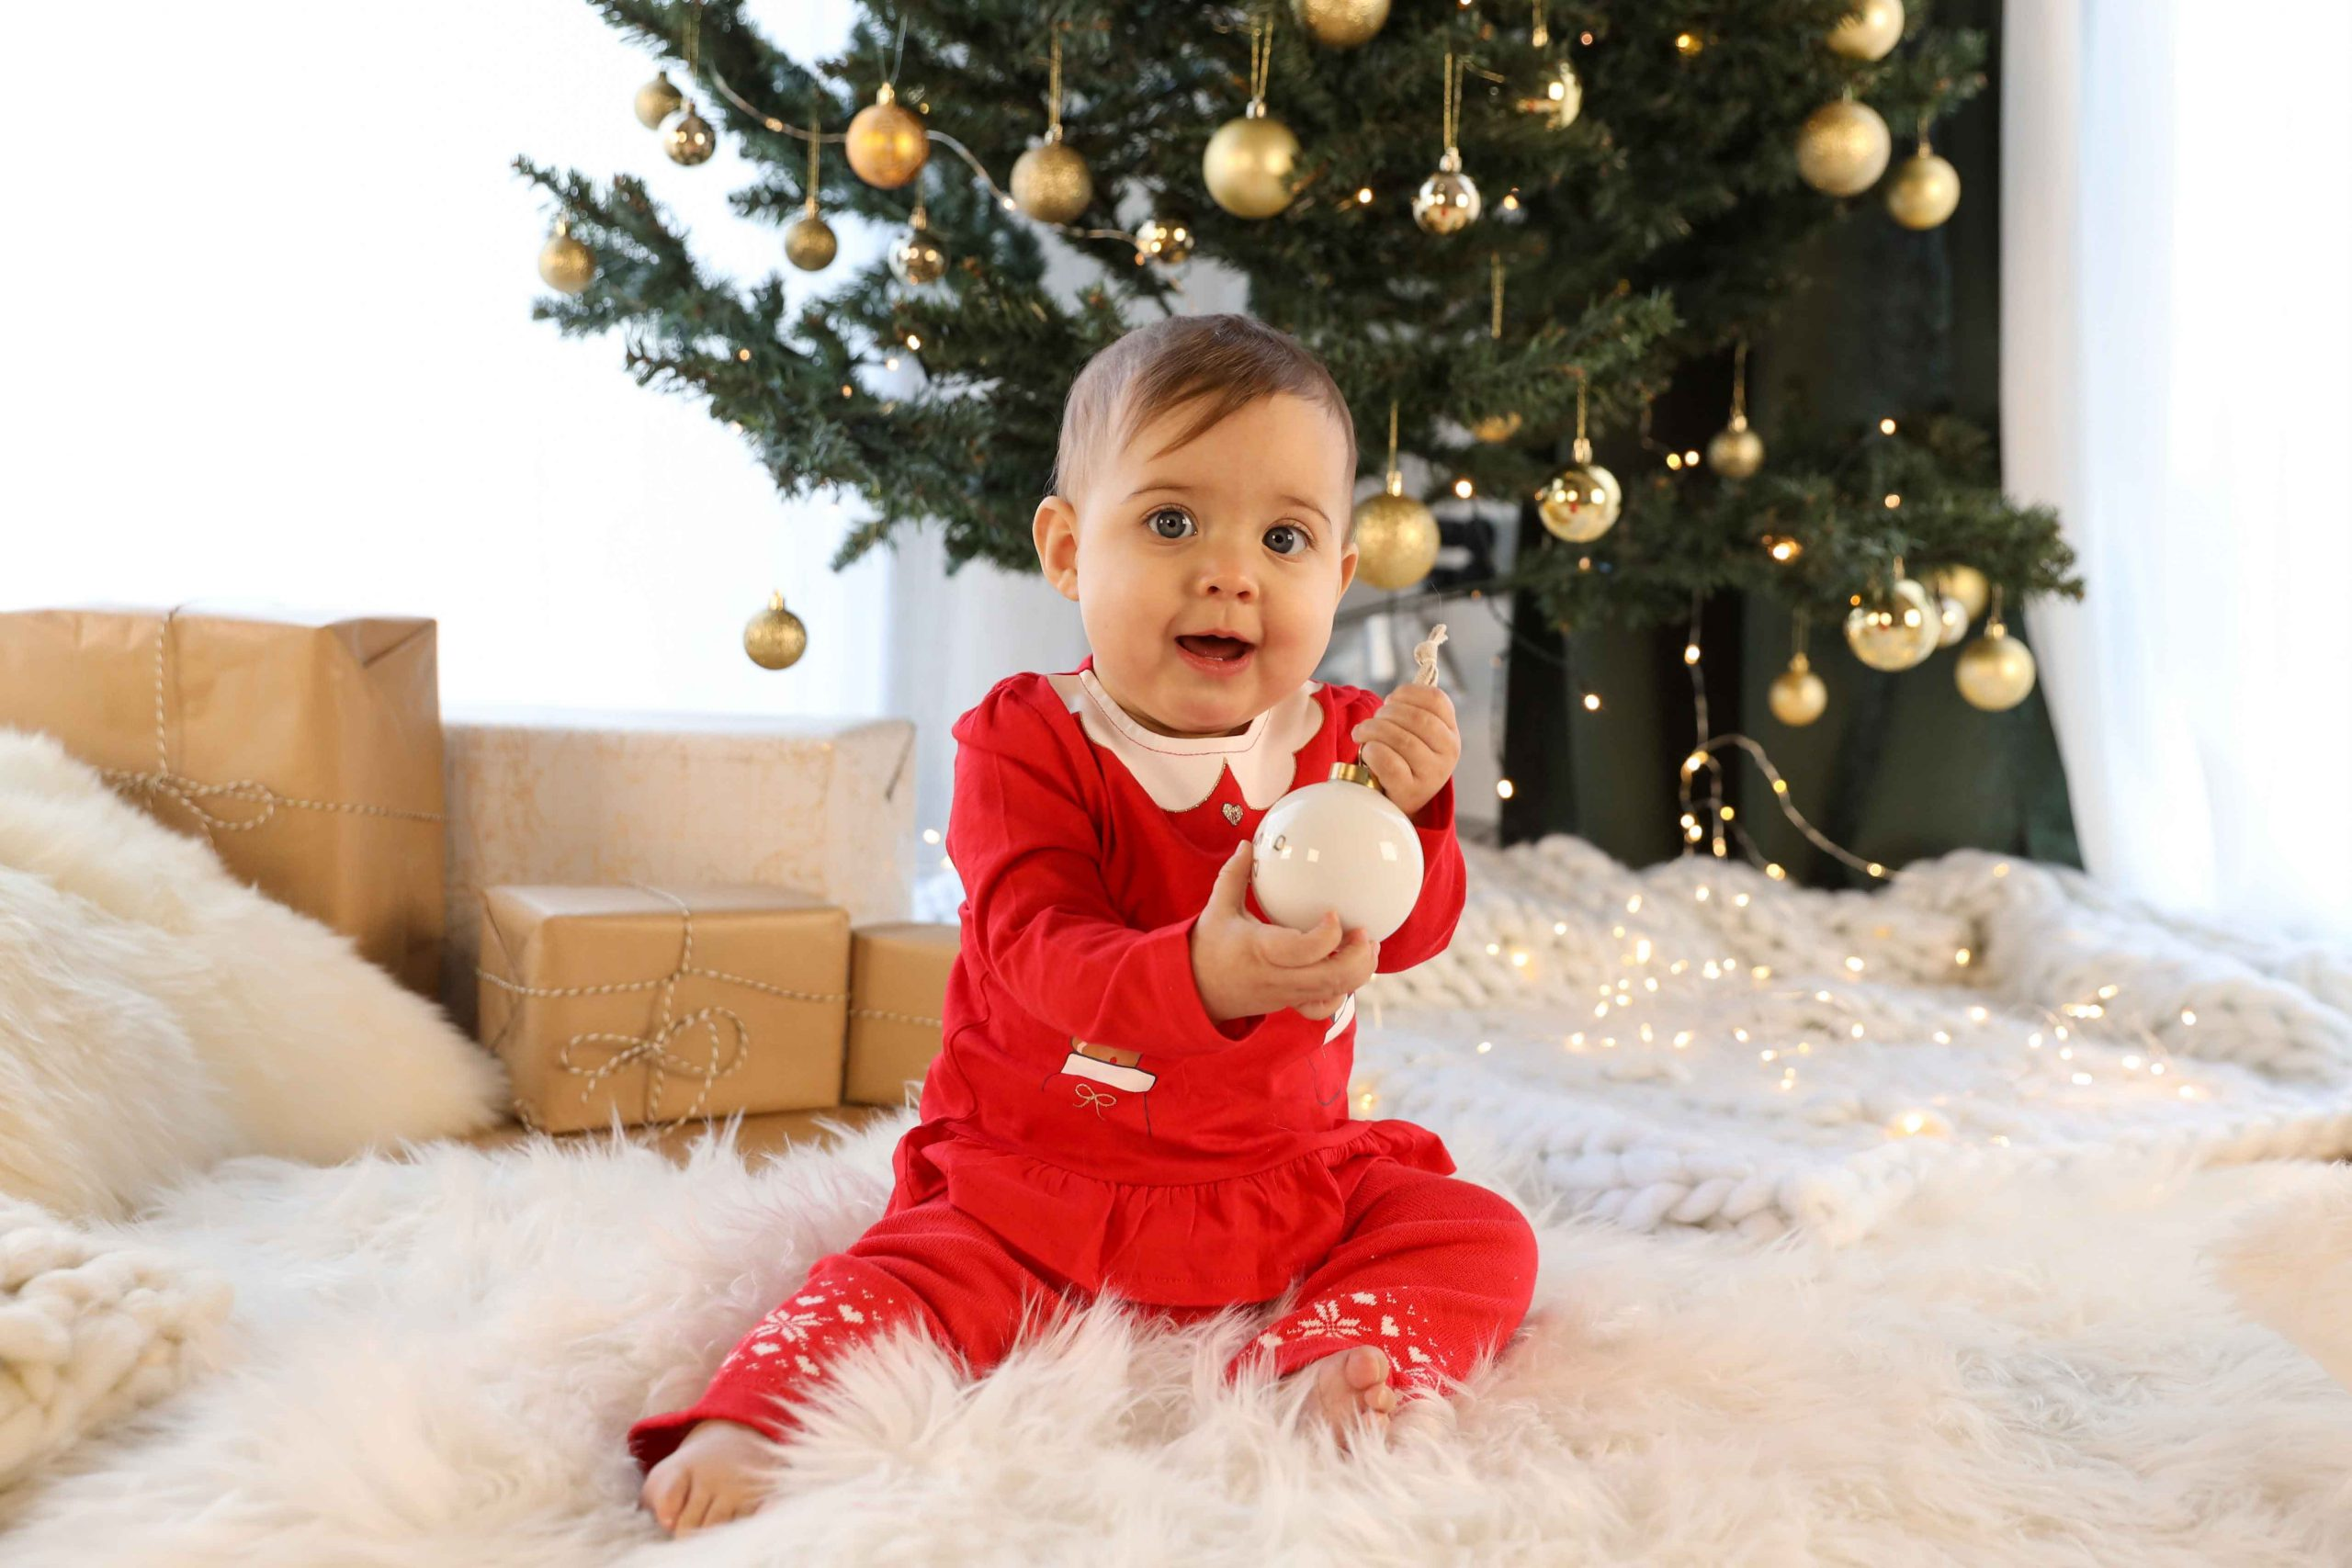 photographe bébé noel